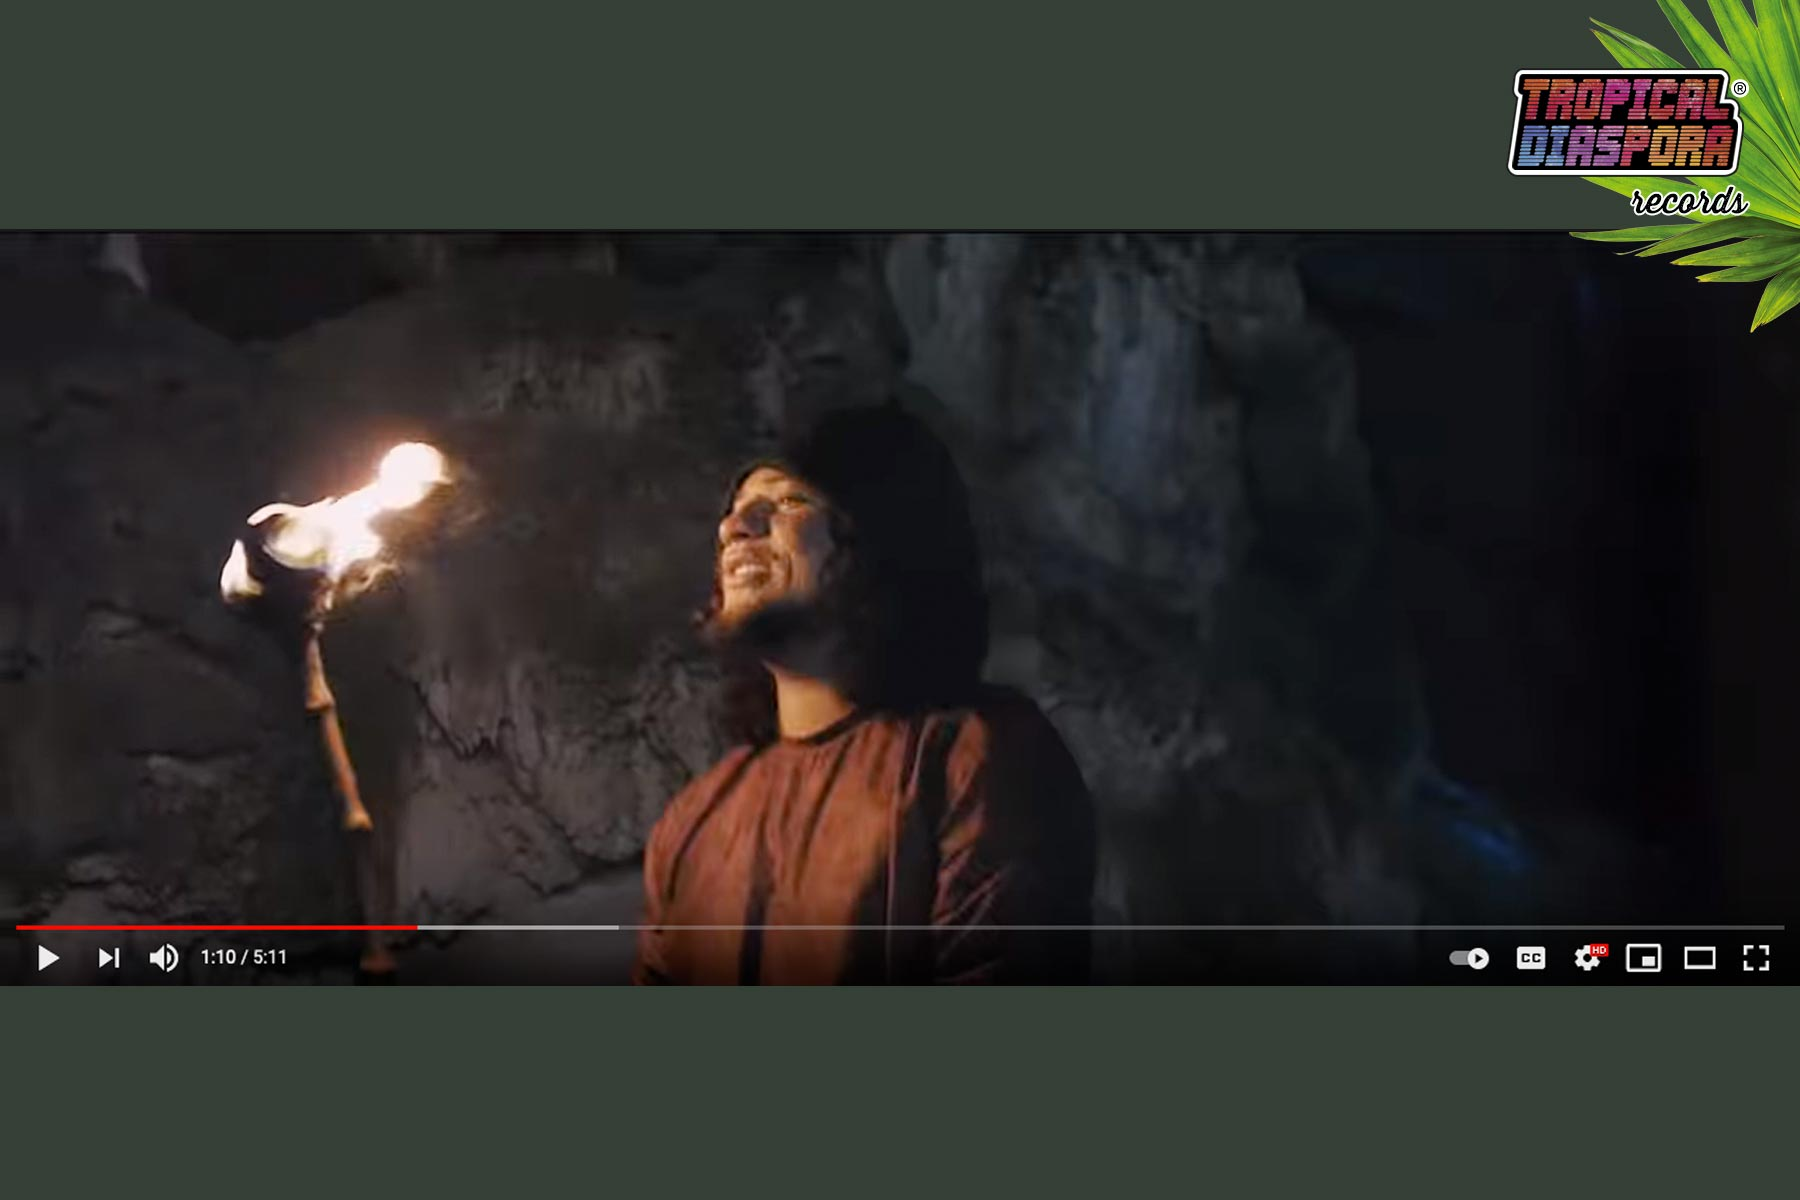 videos RapaduraBaianaSystemOlhoDeBoi